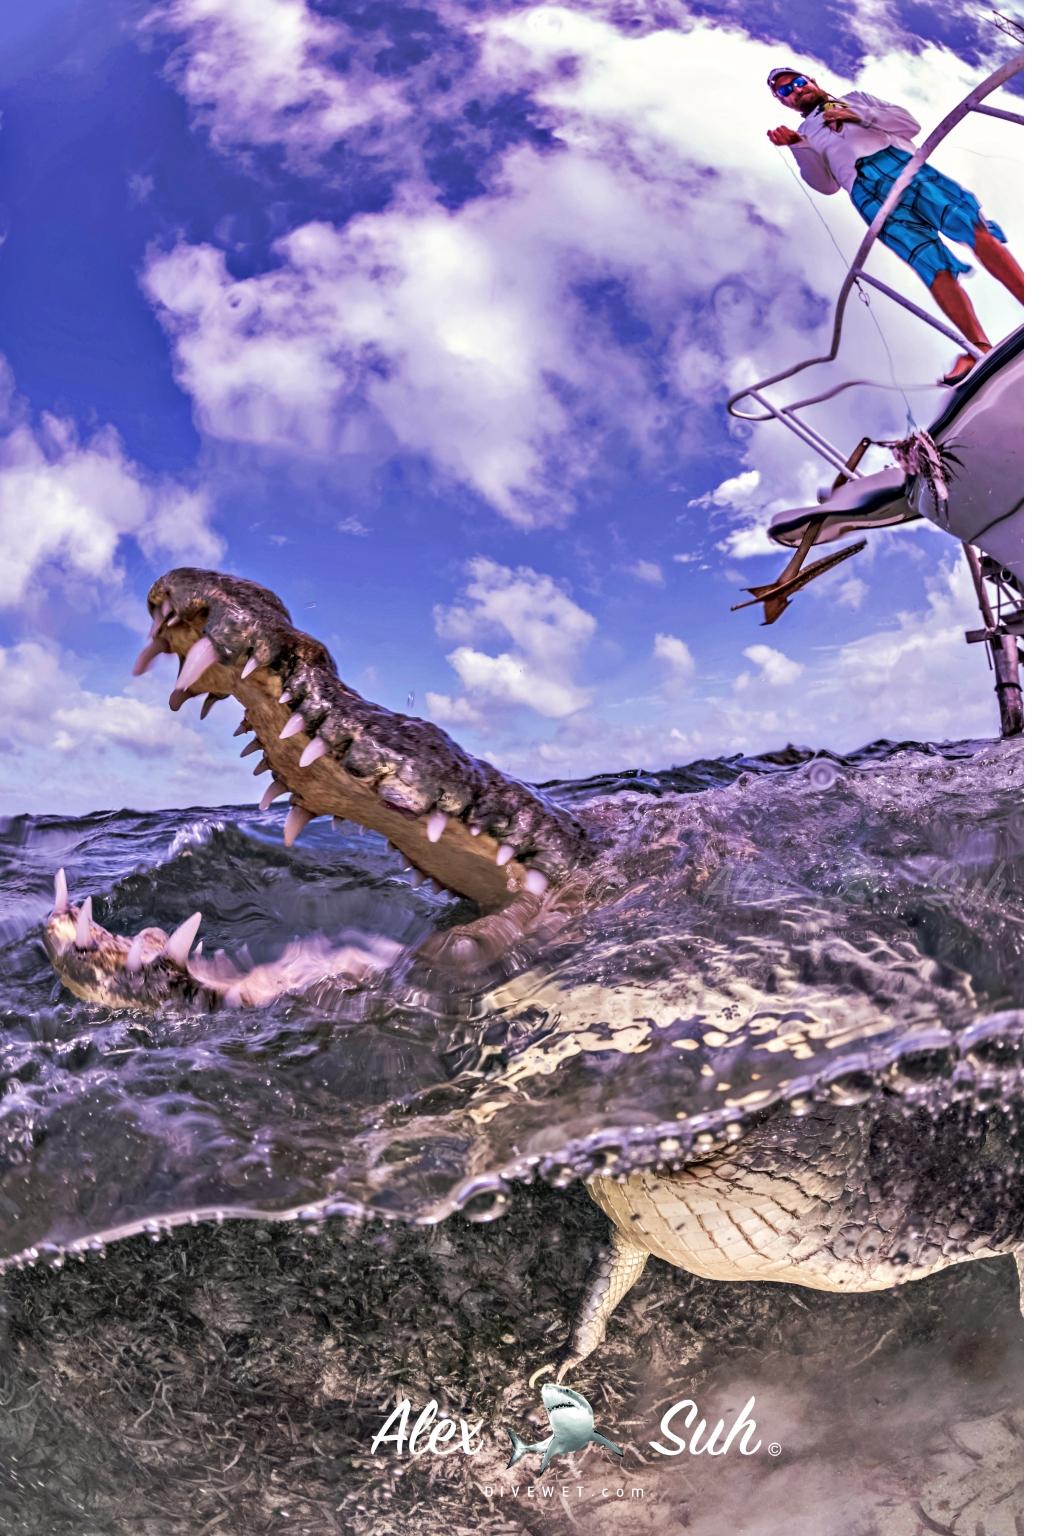 MARKED Croc OU Vert Mouth Best Cropped 72dpi.jpg